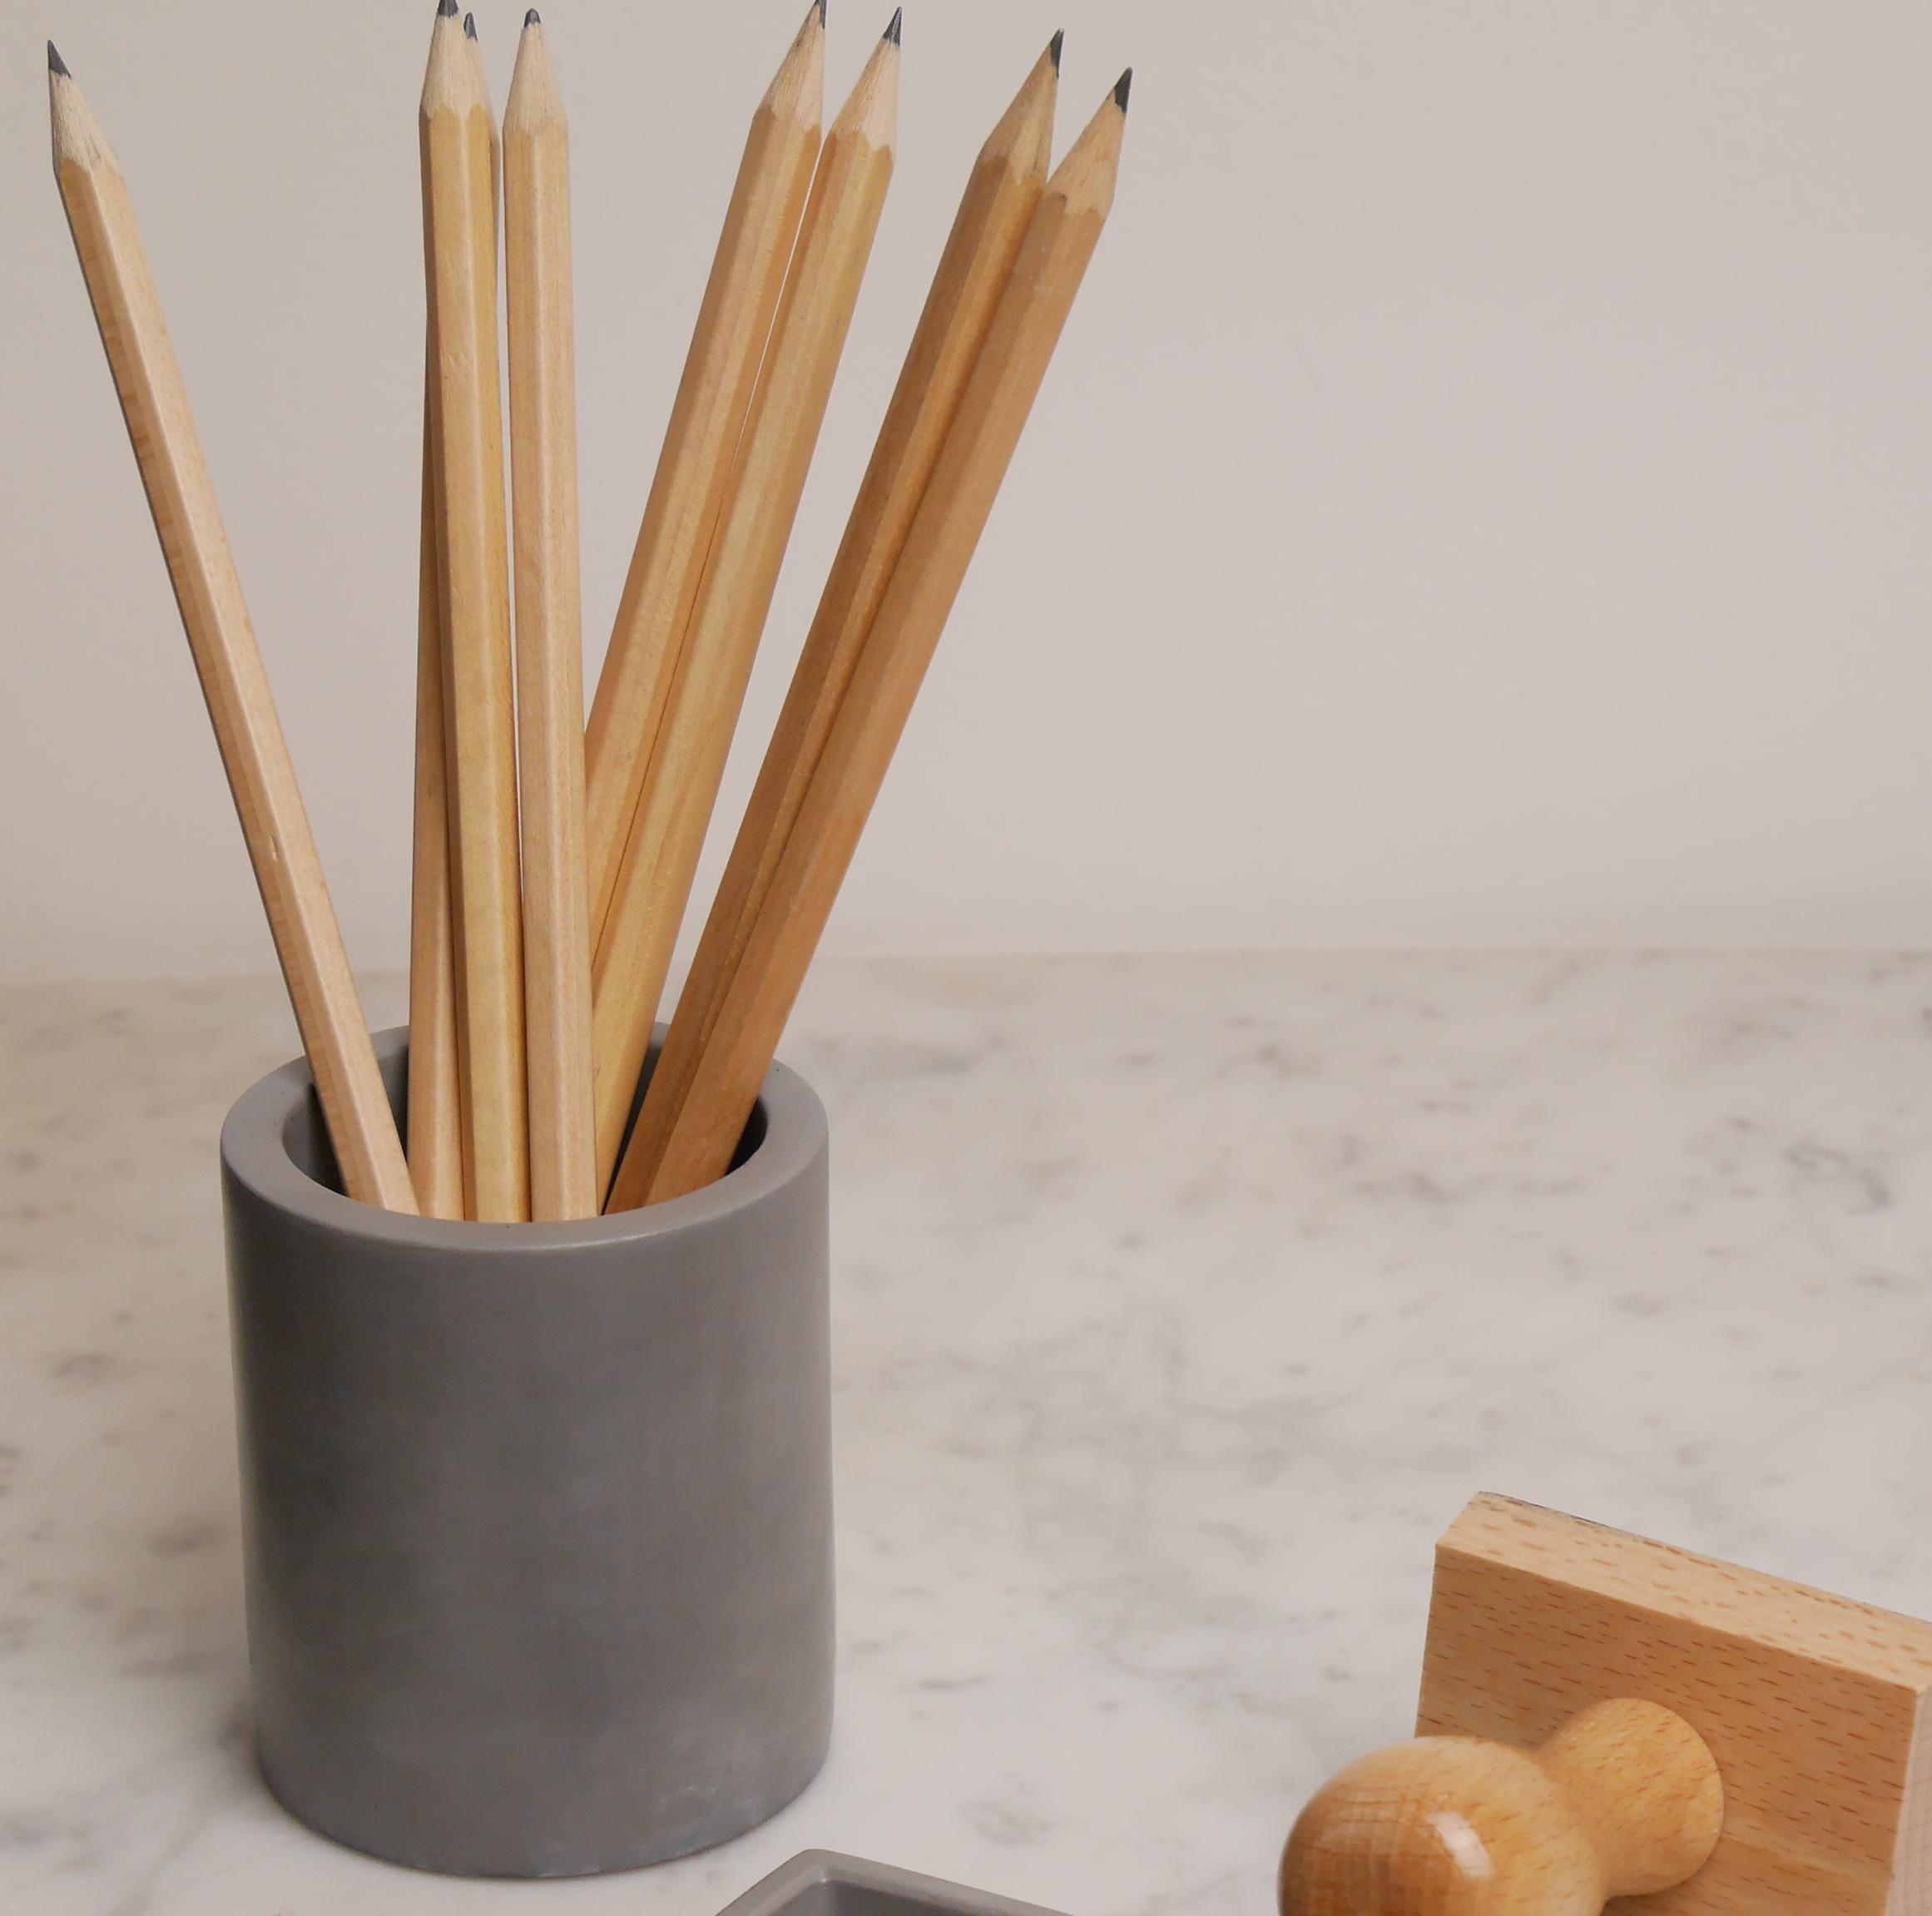 Pot en béton fabrication française